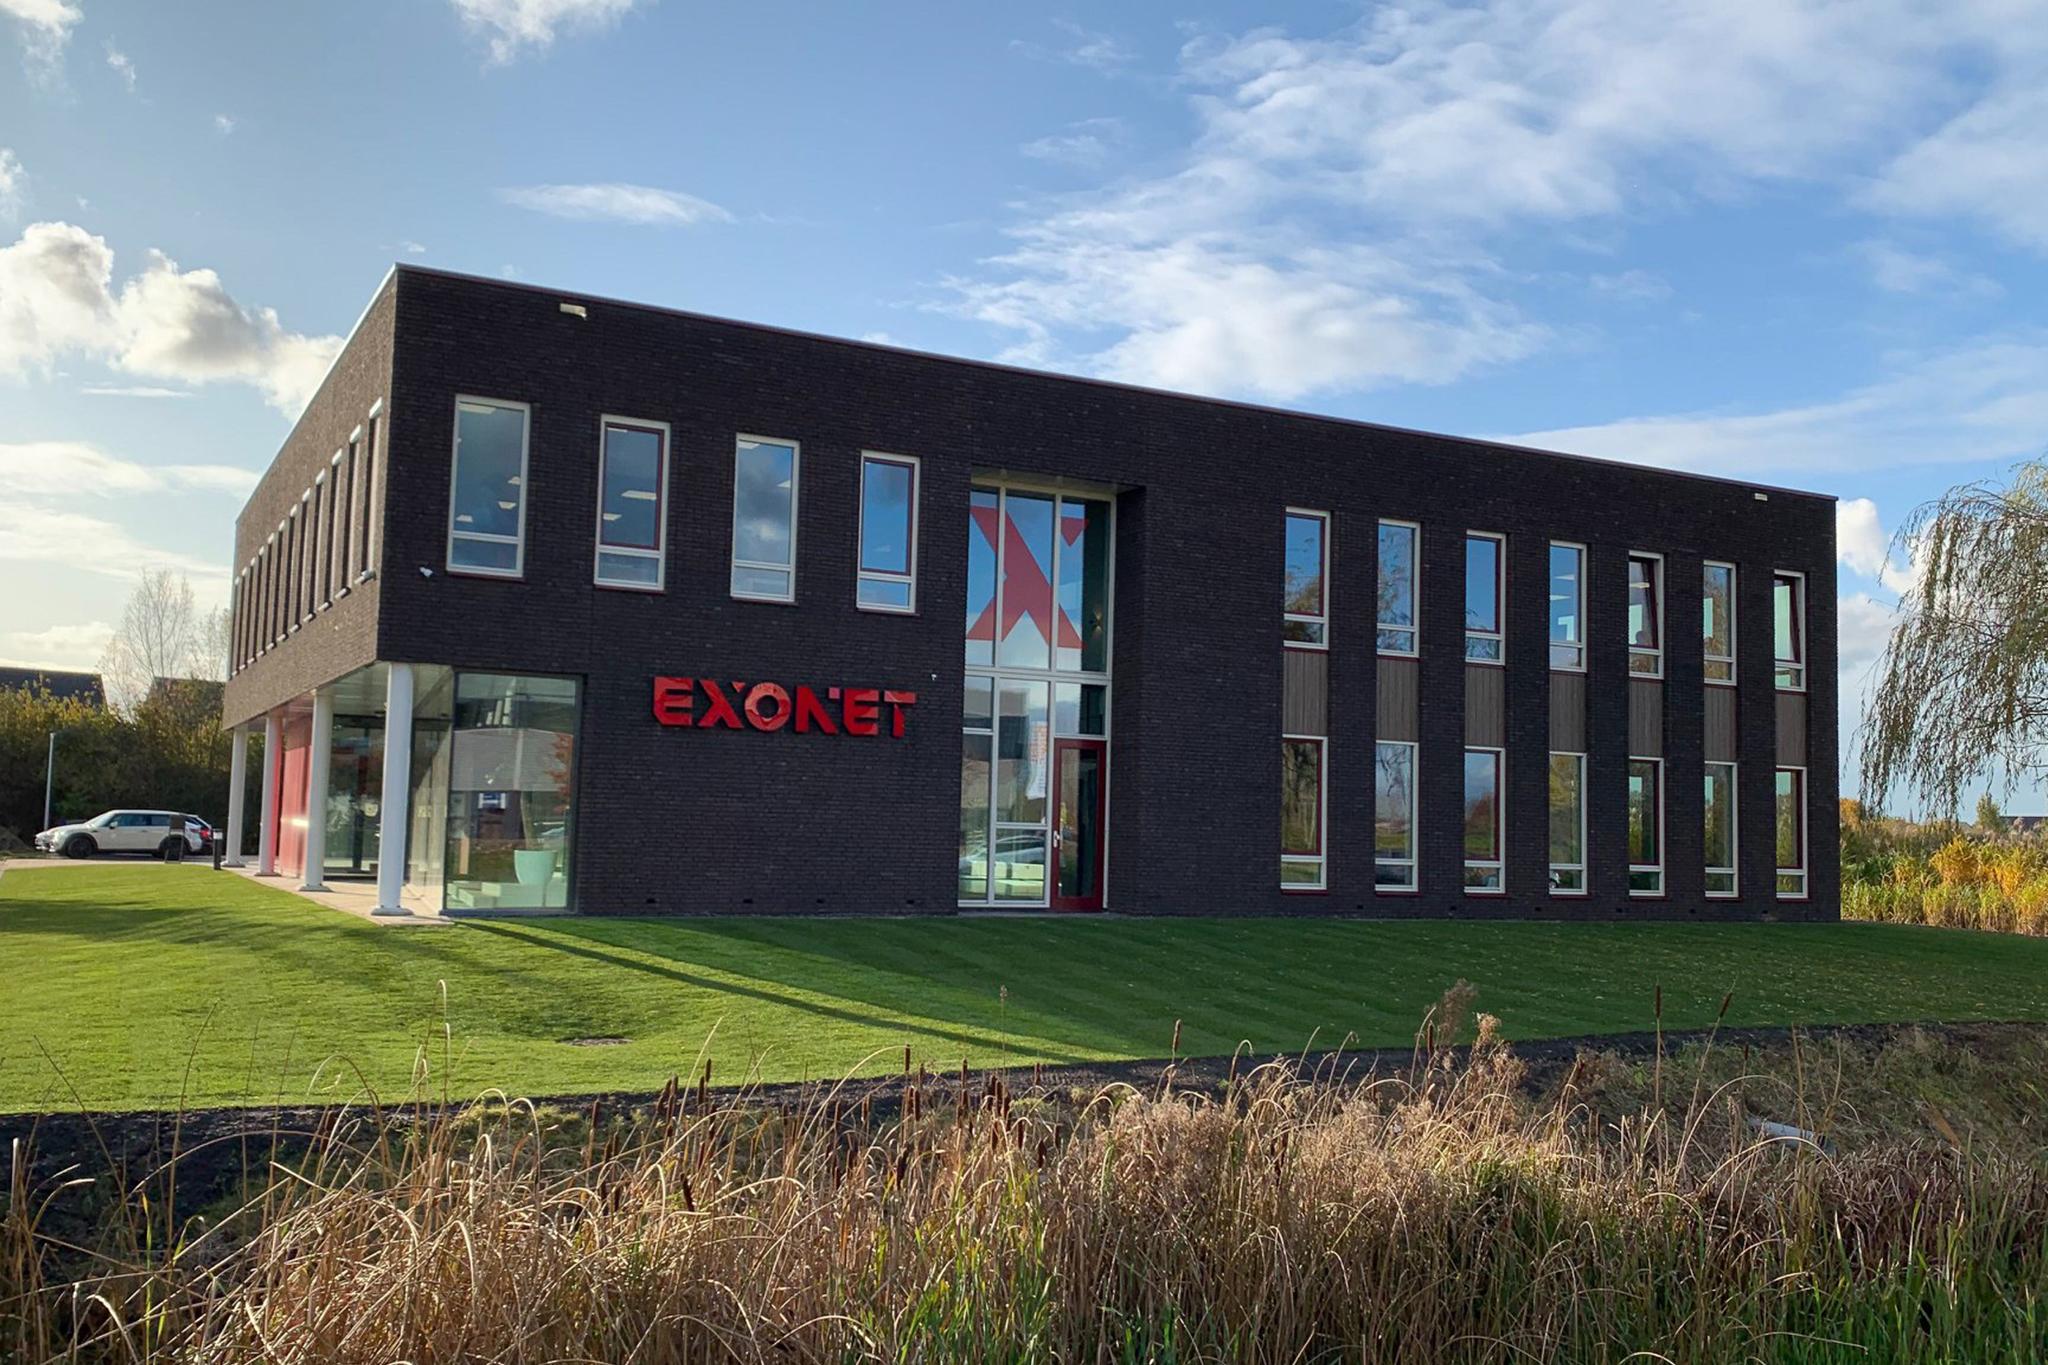 ROSH Studios Exonet Pand